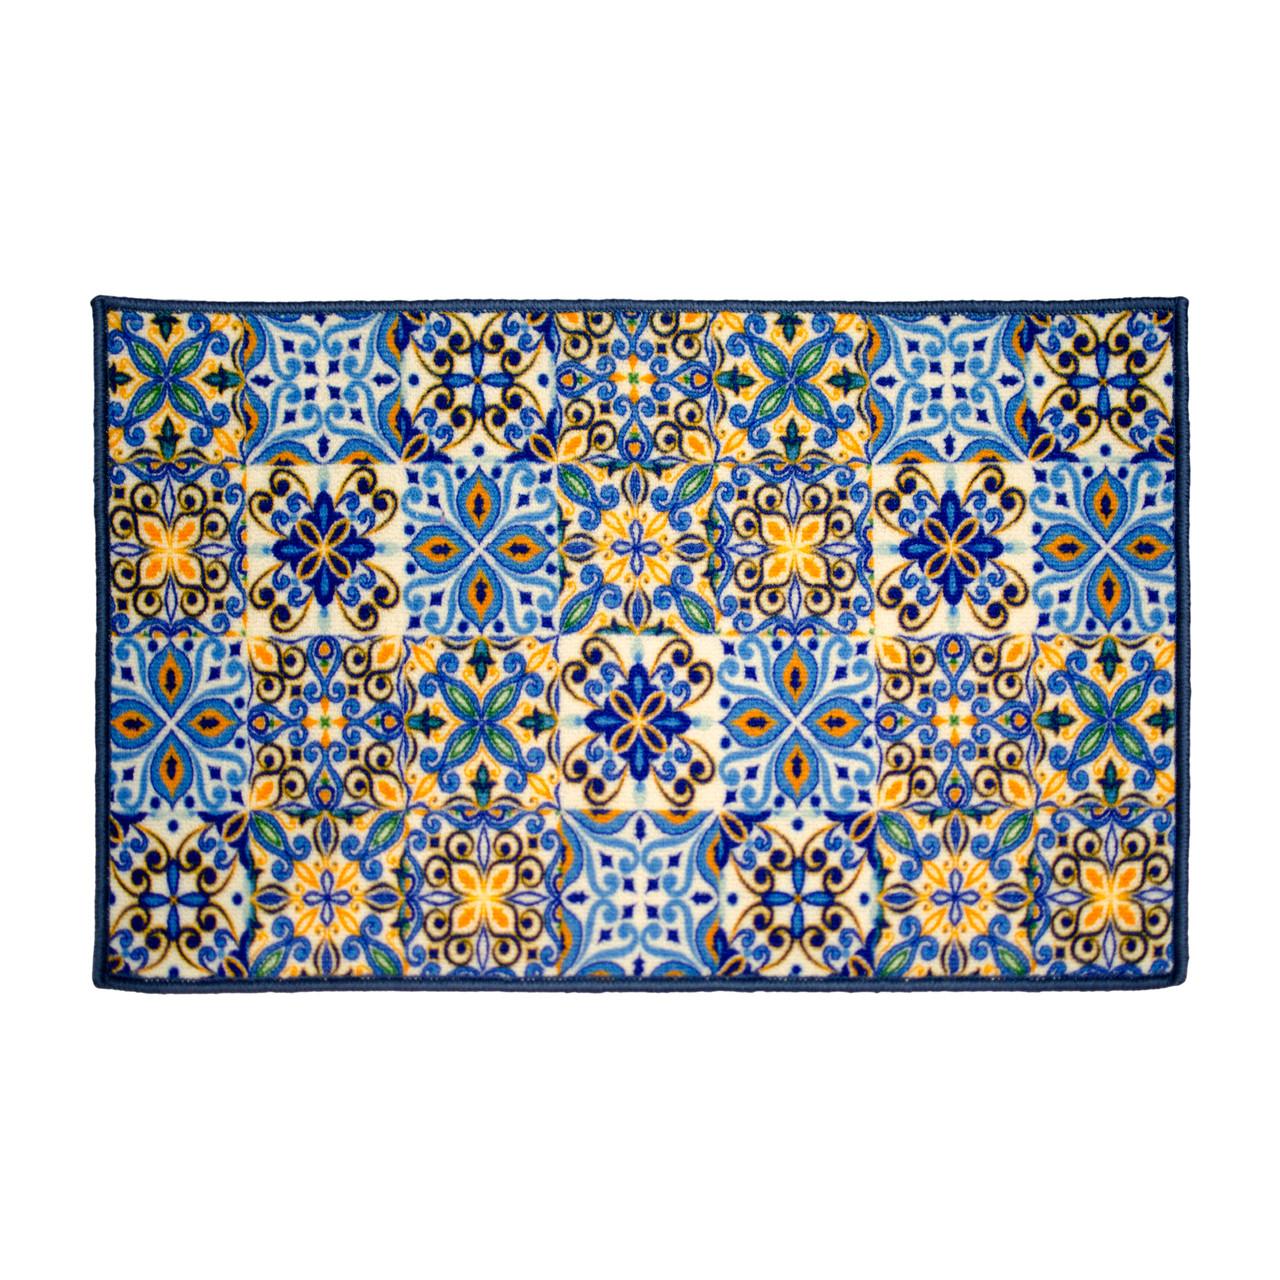 Kashi Home Gardena Egyptian Decor Accent Area Rug, Floor Mat - Linen ...